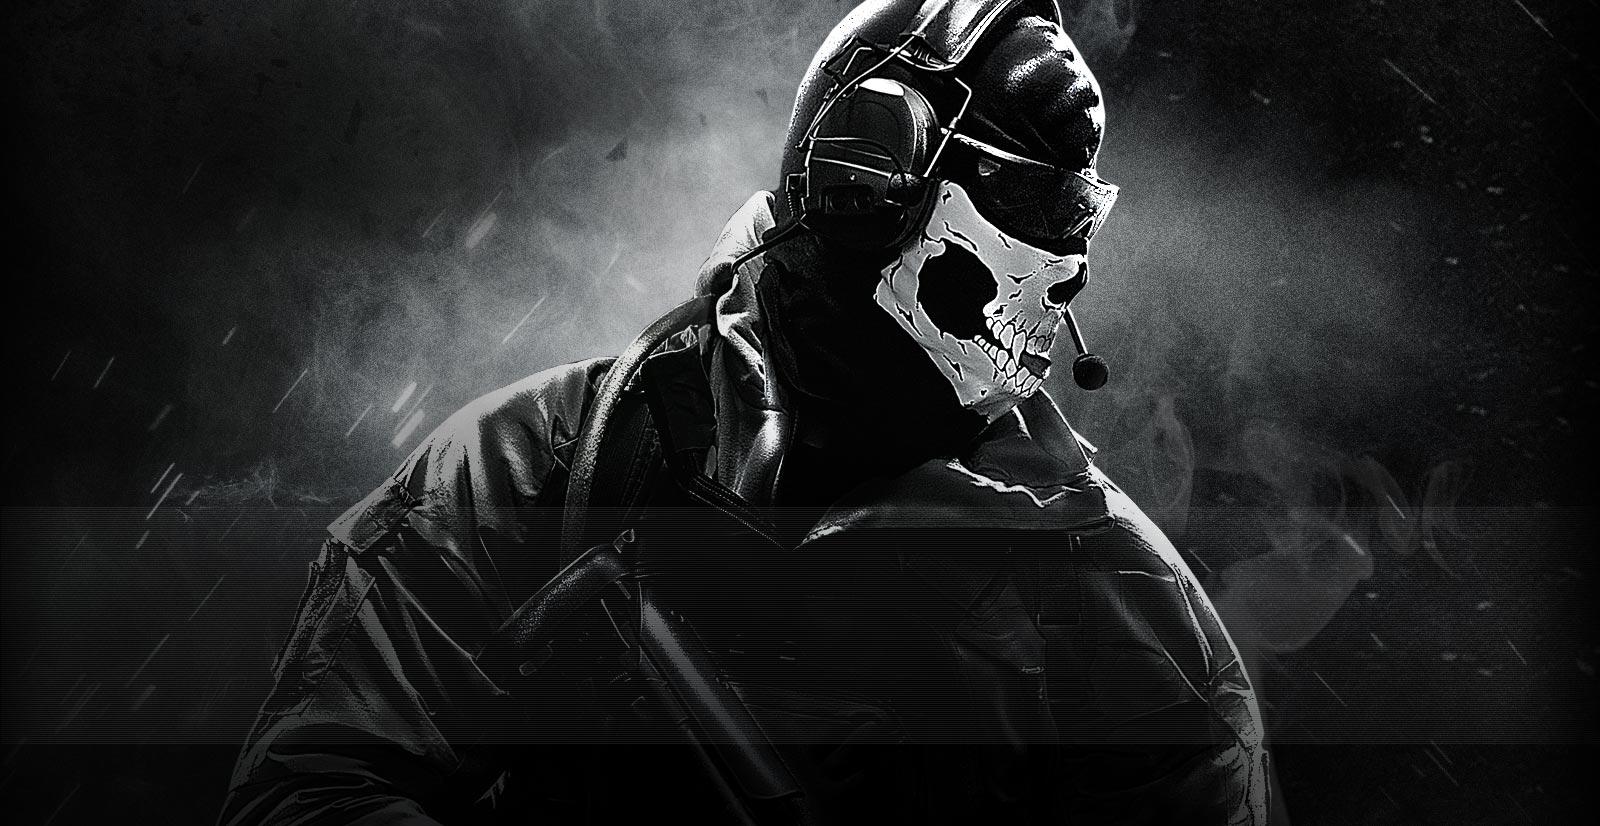 Ghost_Wallpaper_image_CoDO